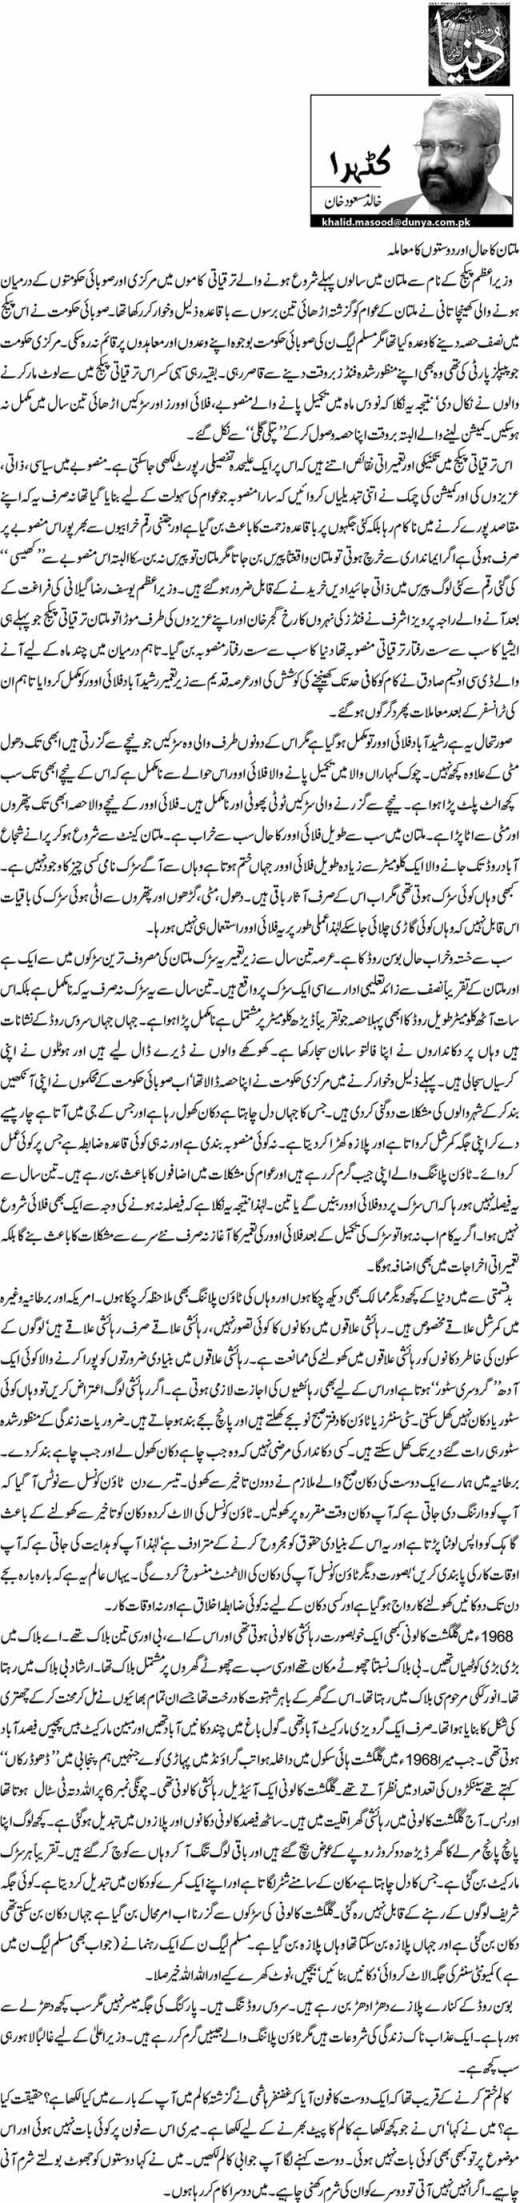 Multan Ka Haal Aur Doston Ka Muamla - Khalid Masood Khan